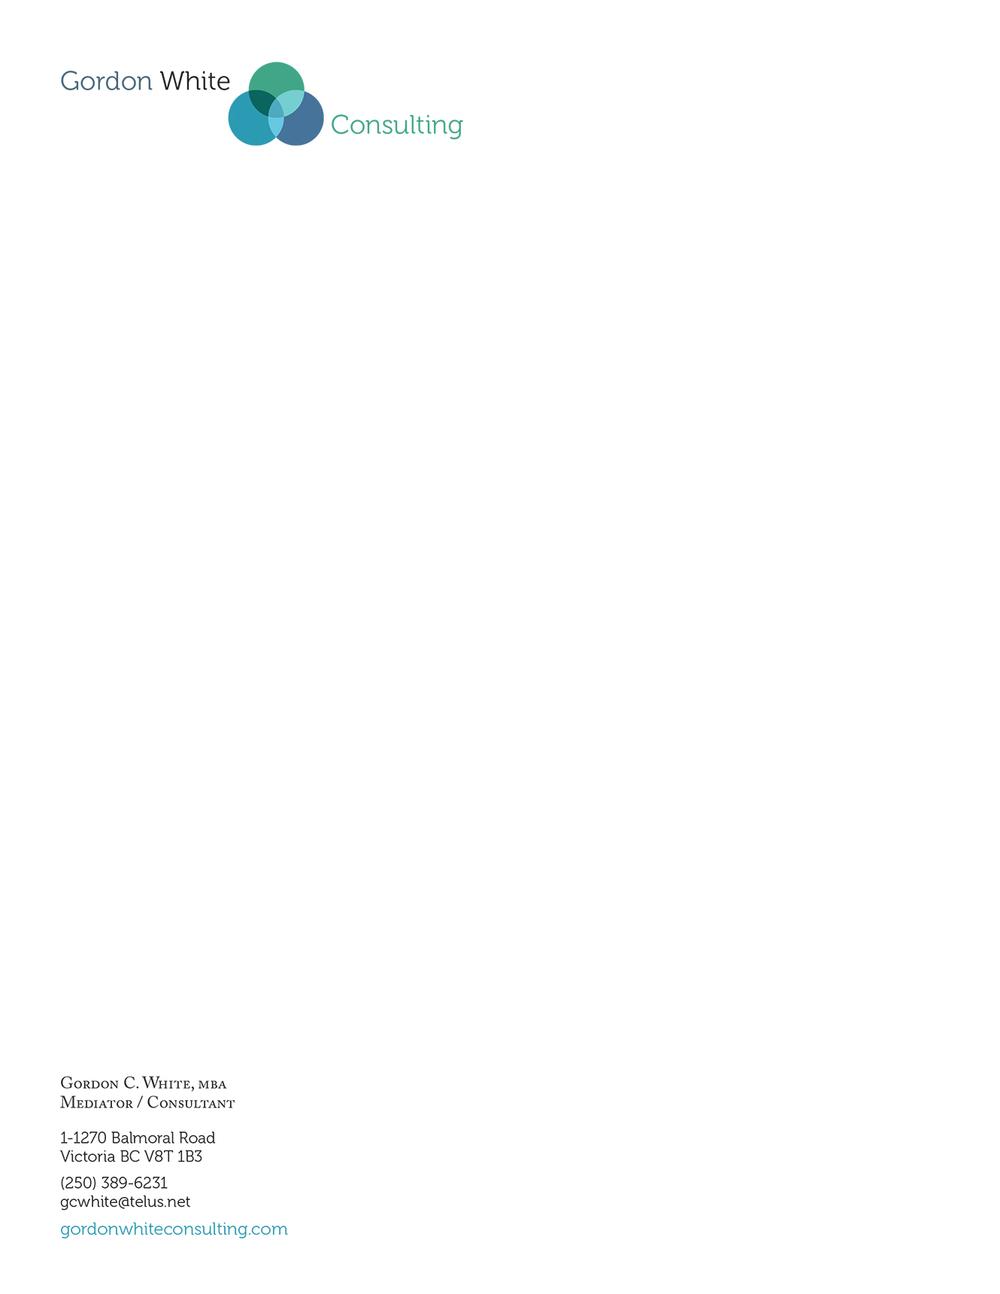 GWC+letterhead+1.jpg